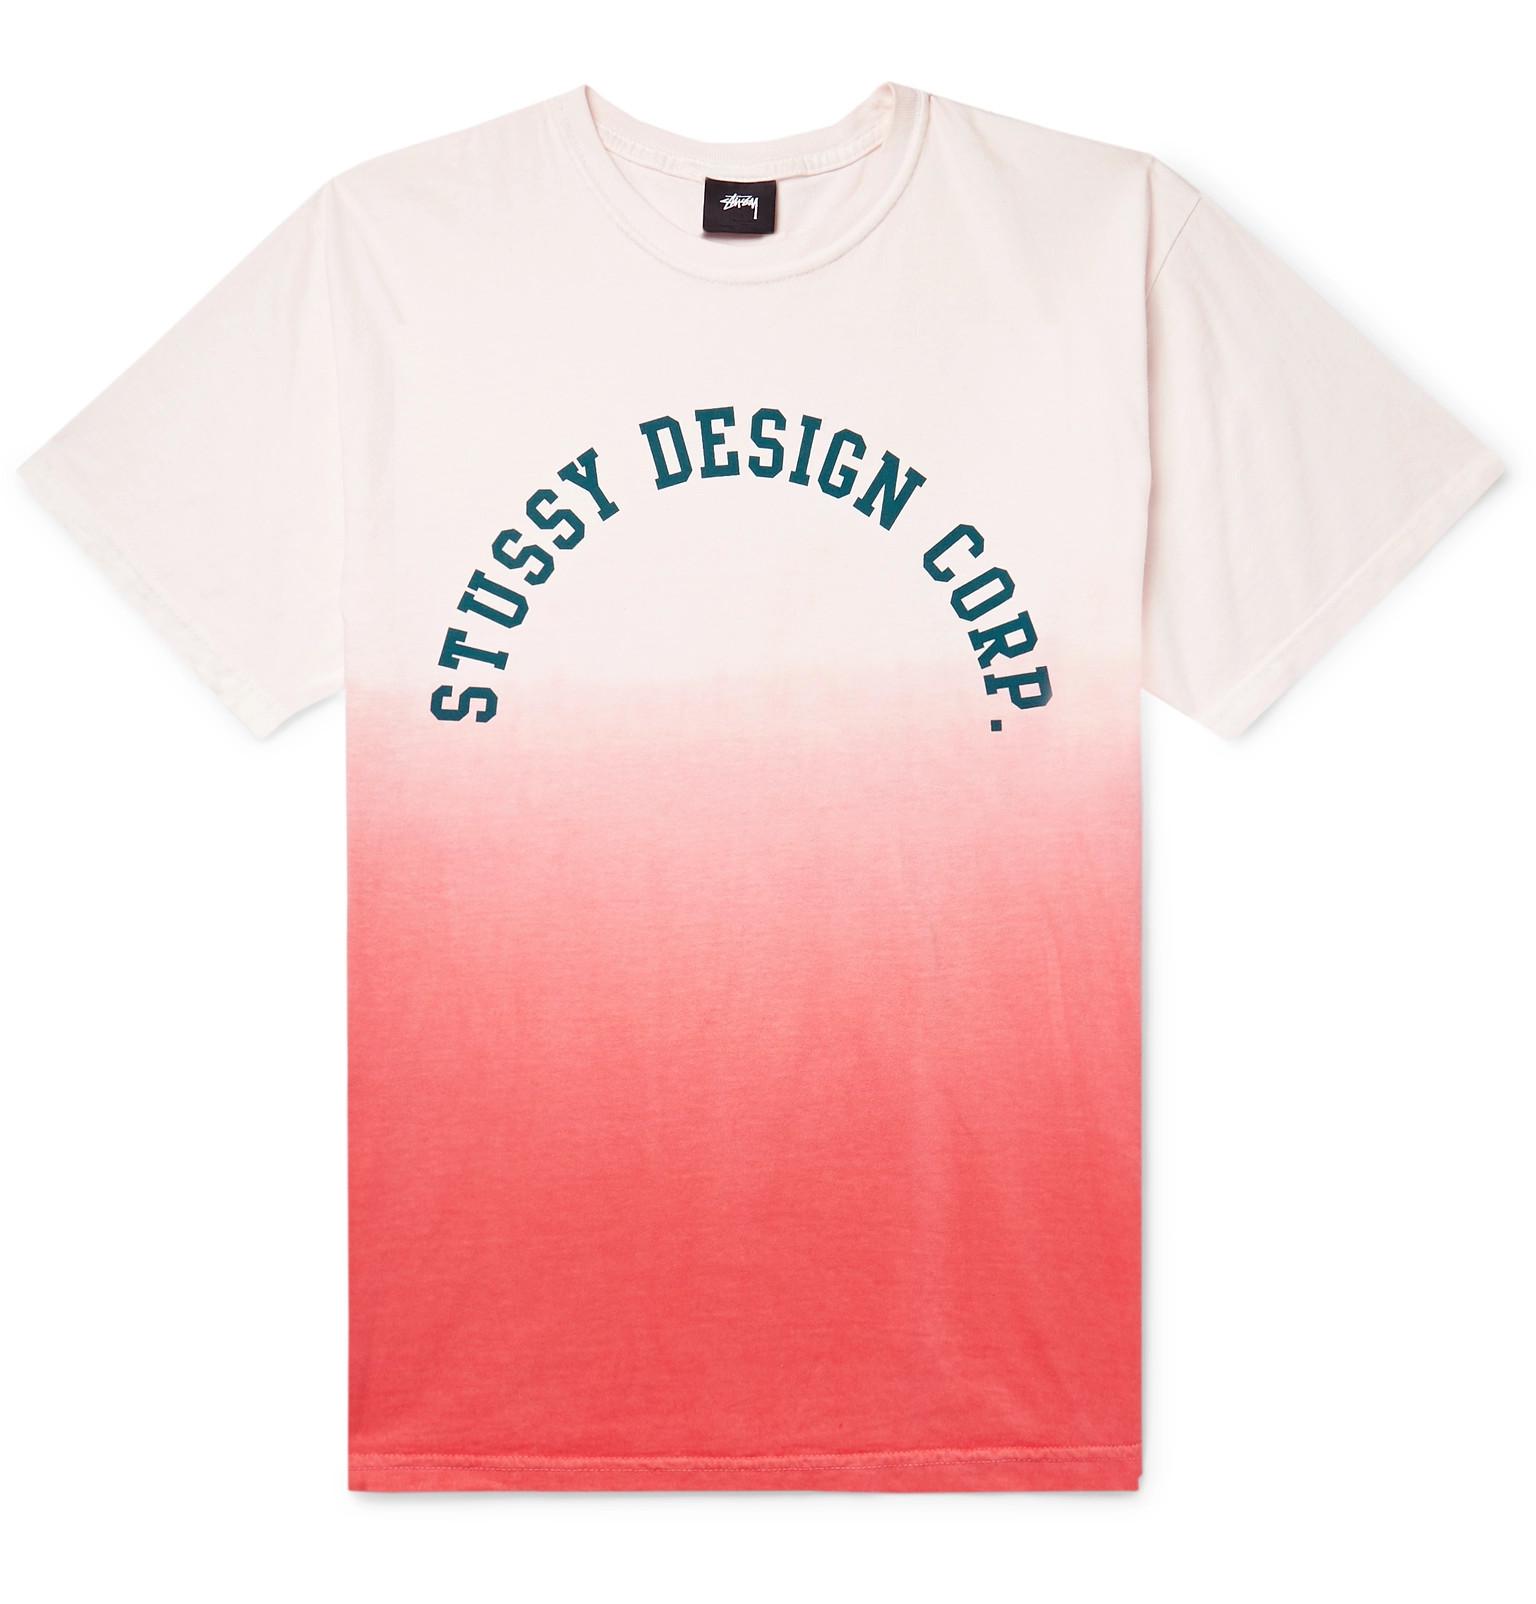 80de4ae732be0 Stüssy - Logo-Print Ombré Cotton-Jersey T-Shirt